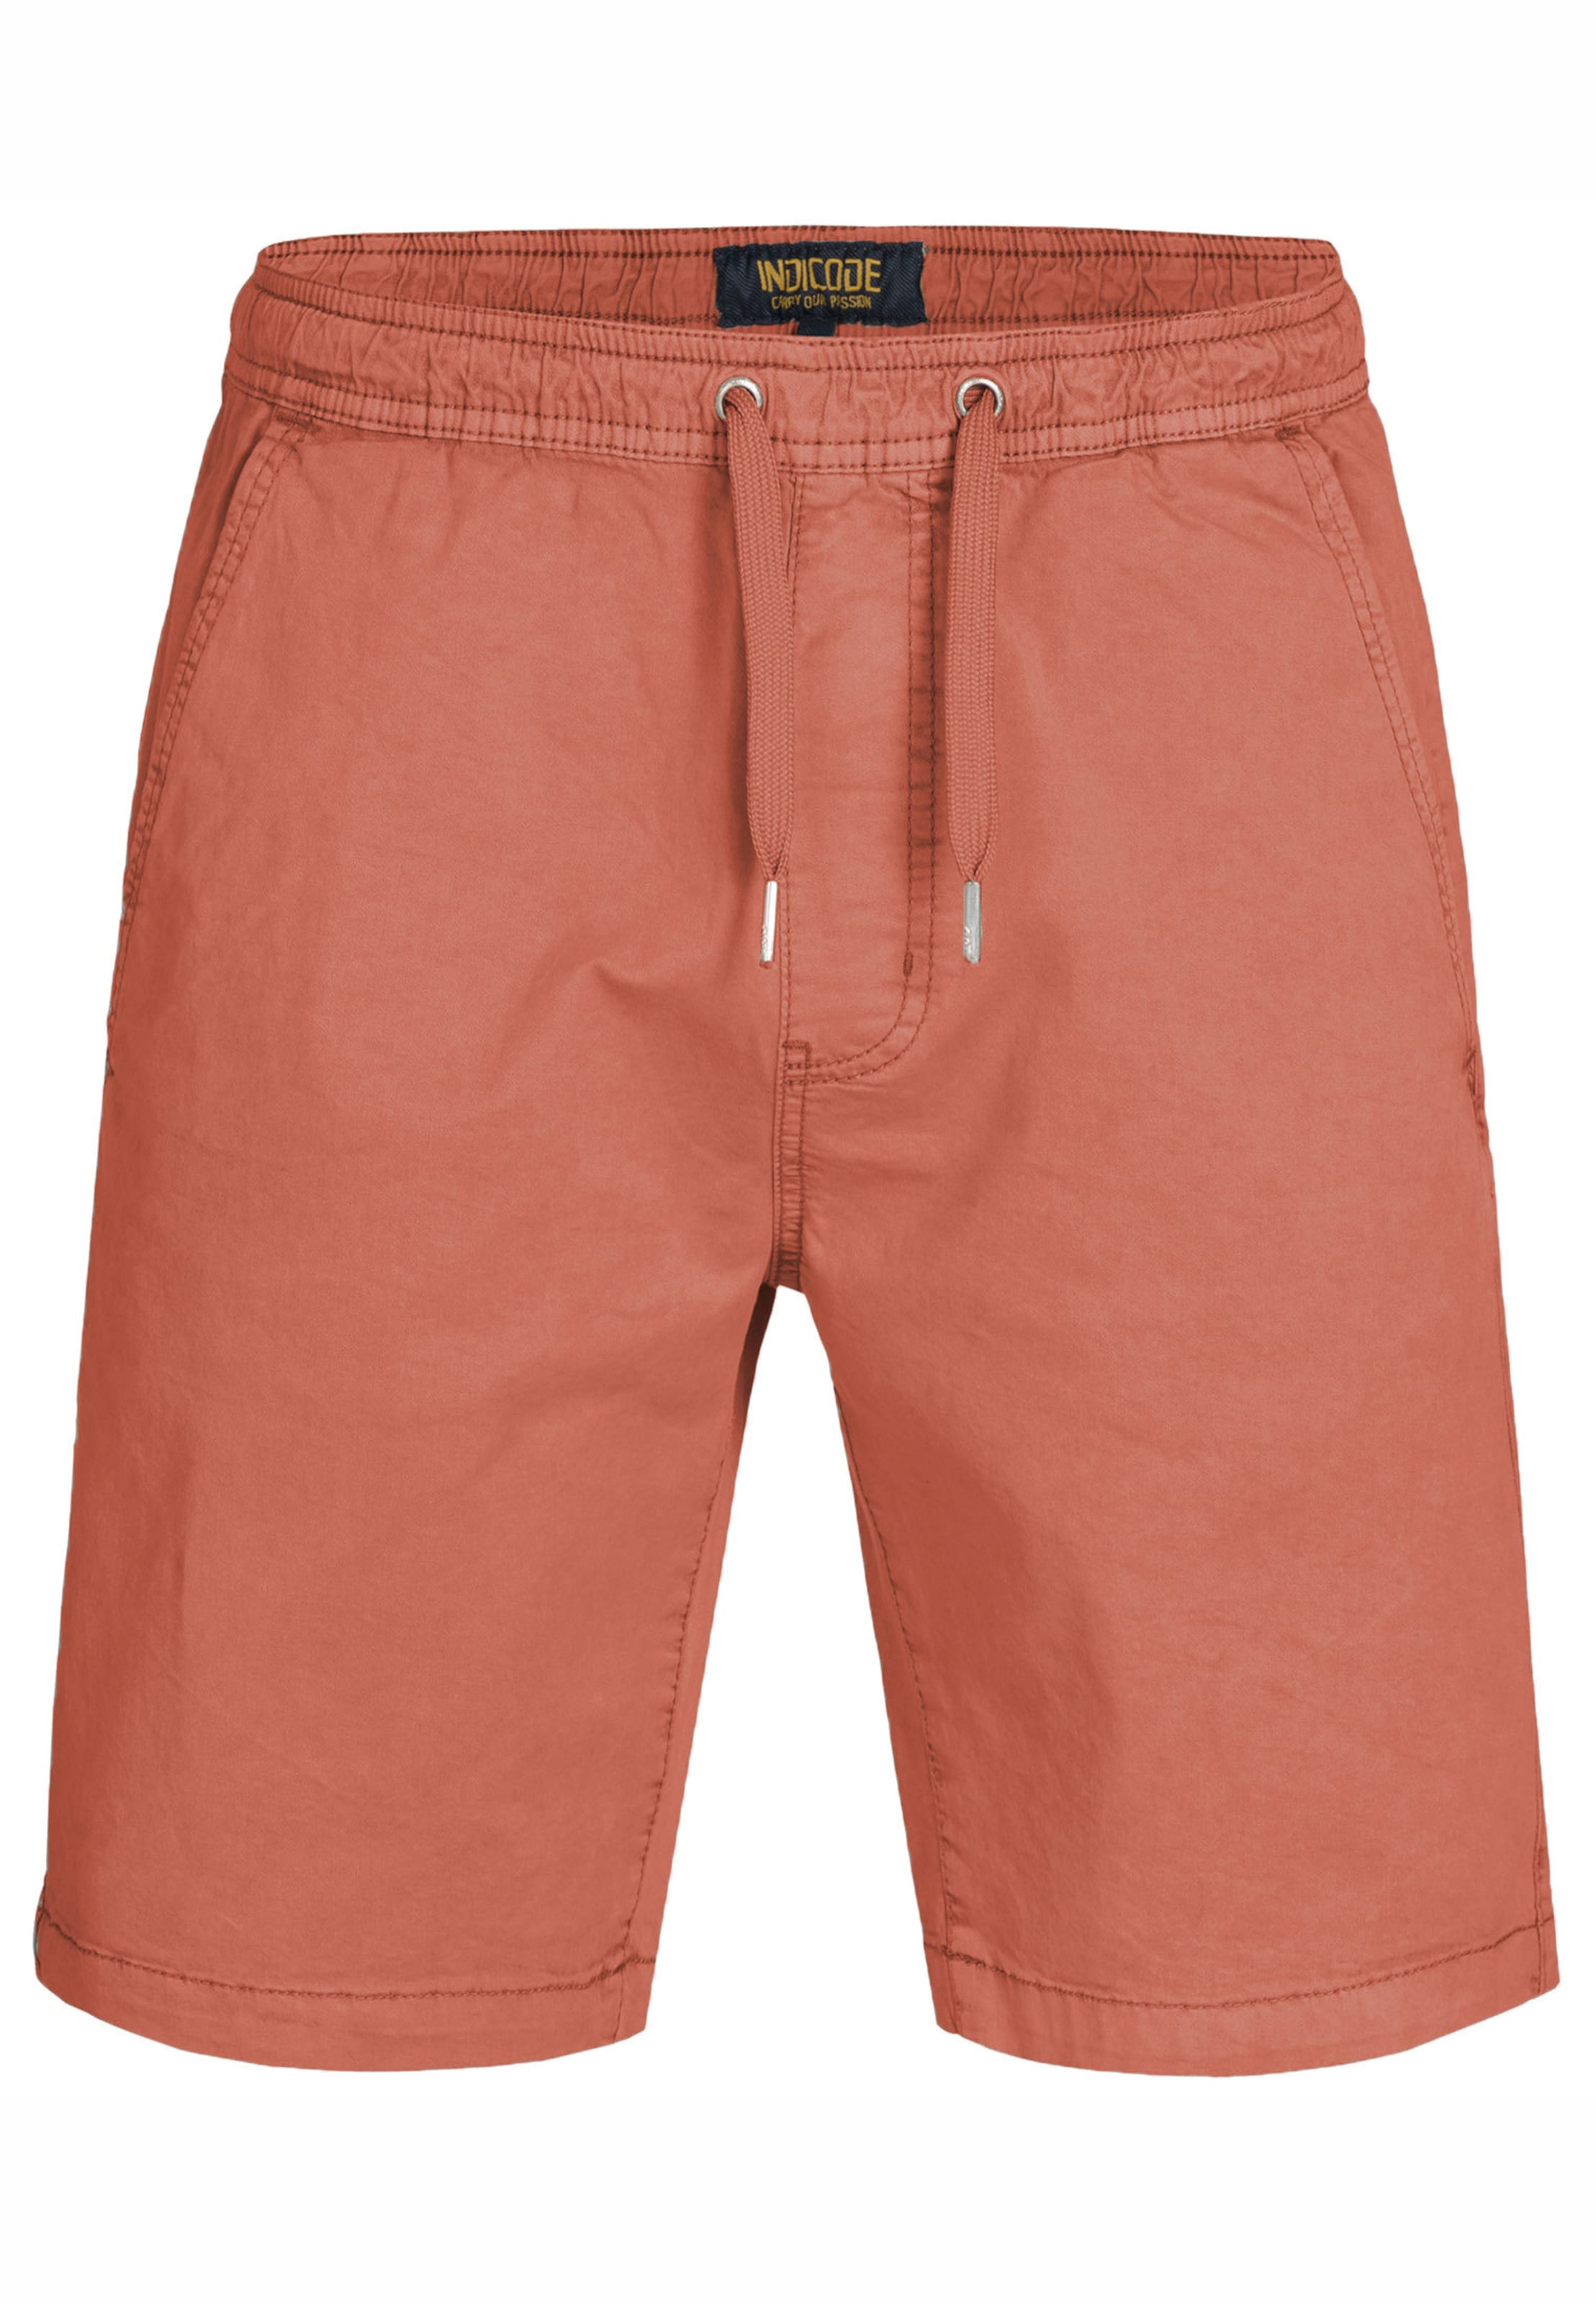 Pantalon En Corail Jeans Indicode Chino 'kelowna' SVMqUpzG